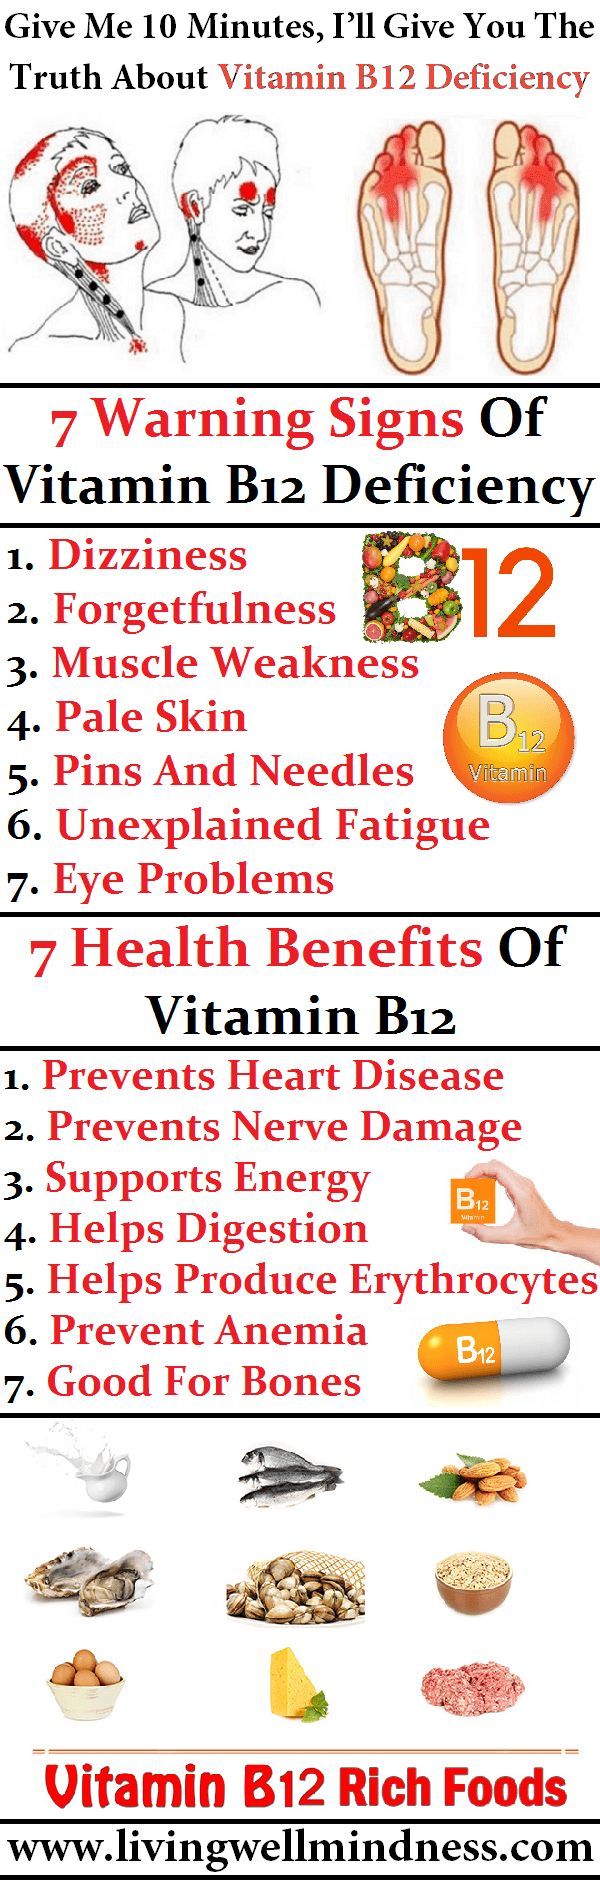 Best 25+ Vitamin b12 ideas on Pinterest | B12 deficiency, B 12 and ...